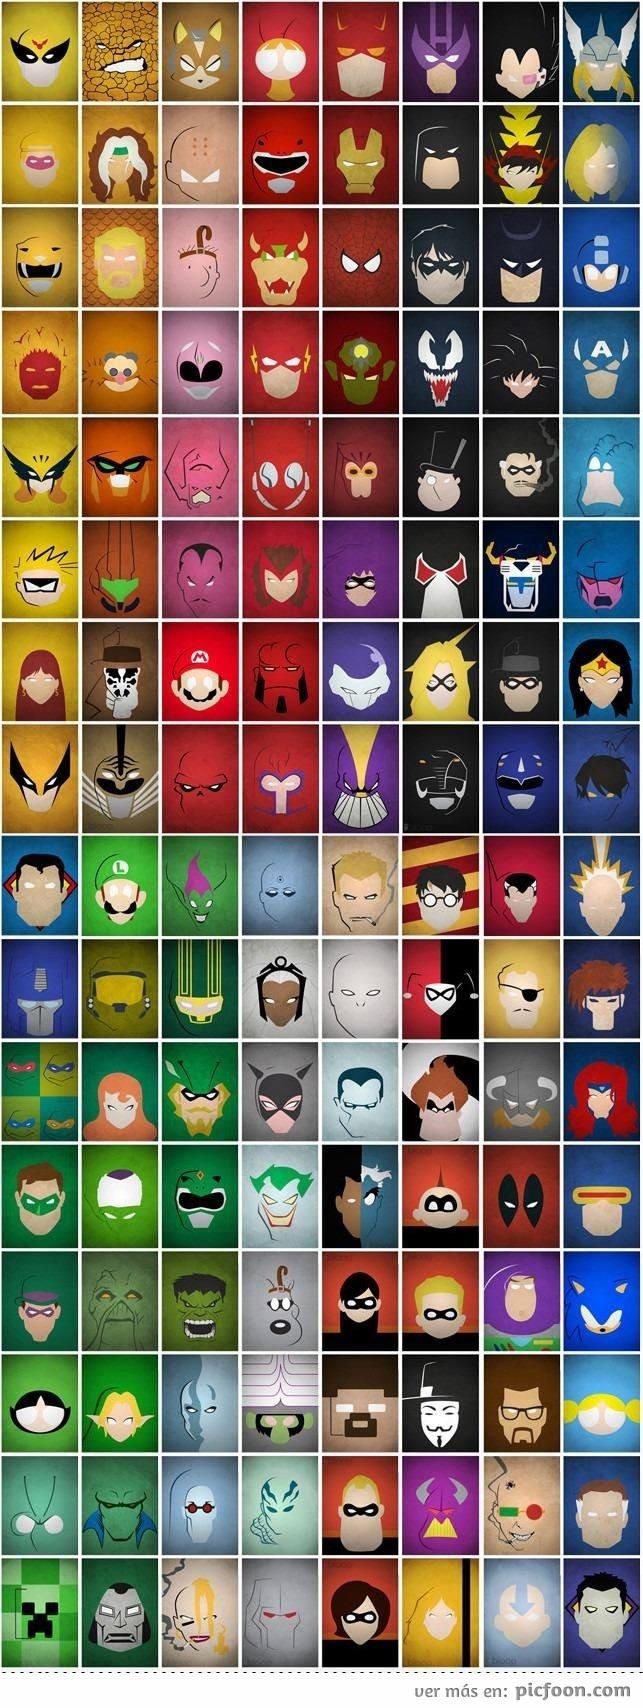 How superheros you can see? n_n